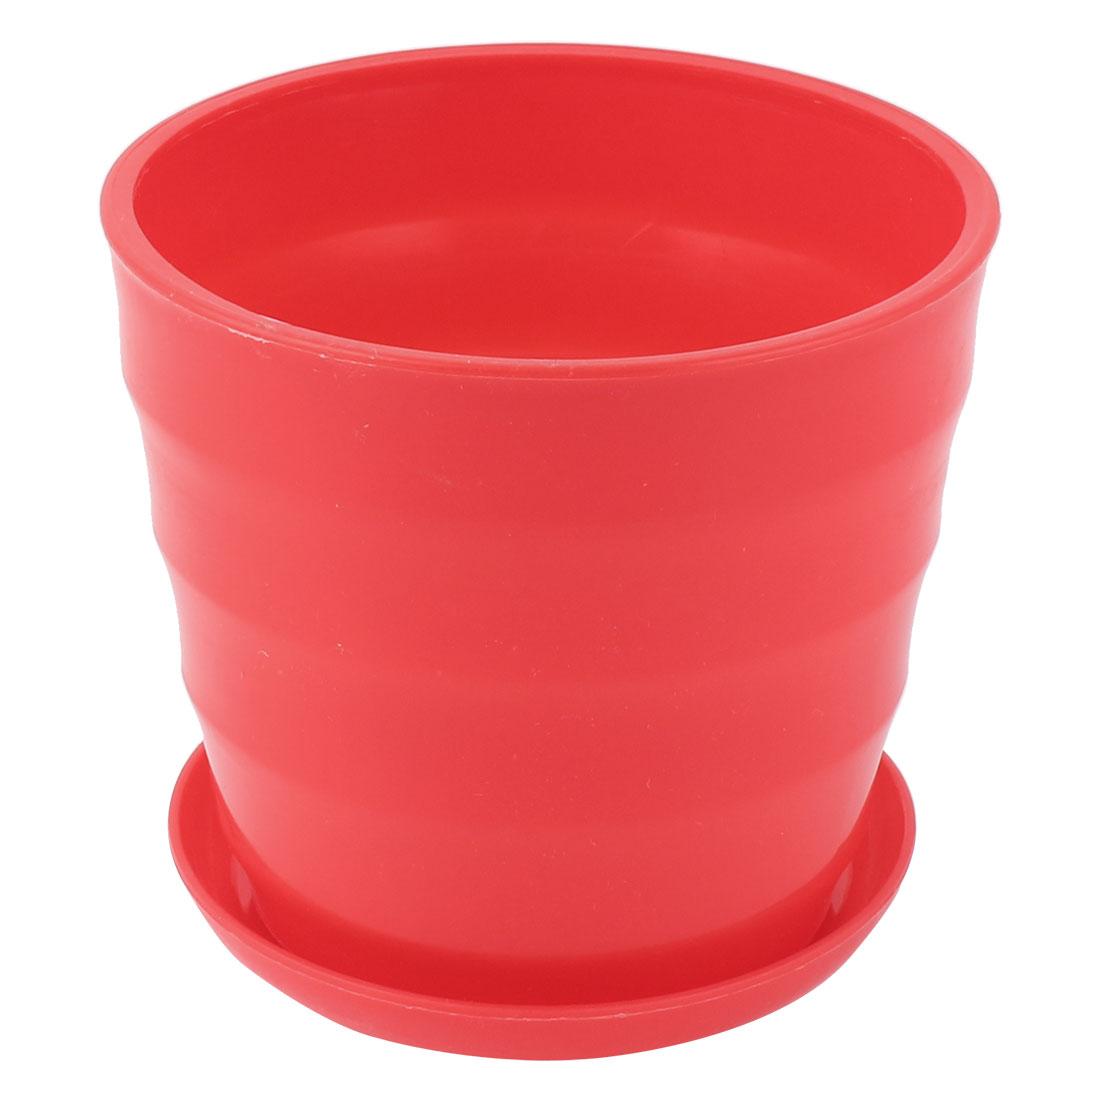 Home Garden Office Desk Plastic Round Plant Planter Holder Flower Pot Red